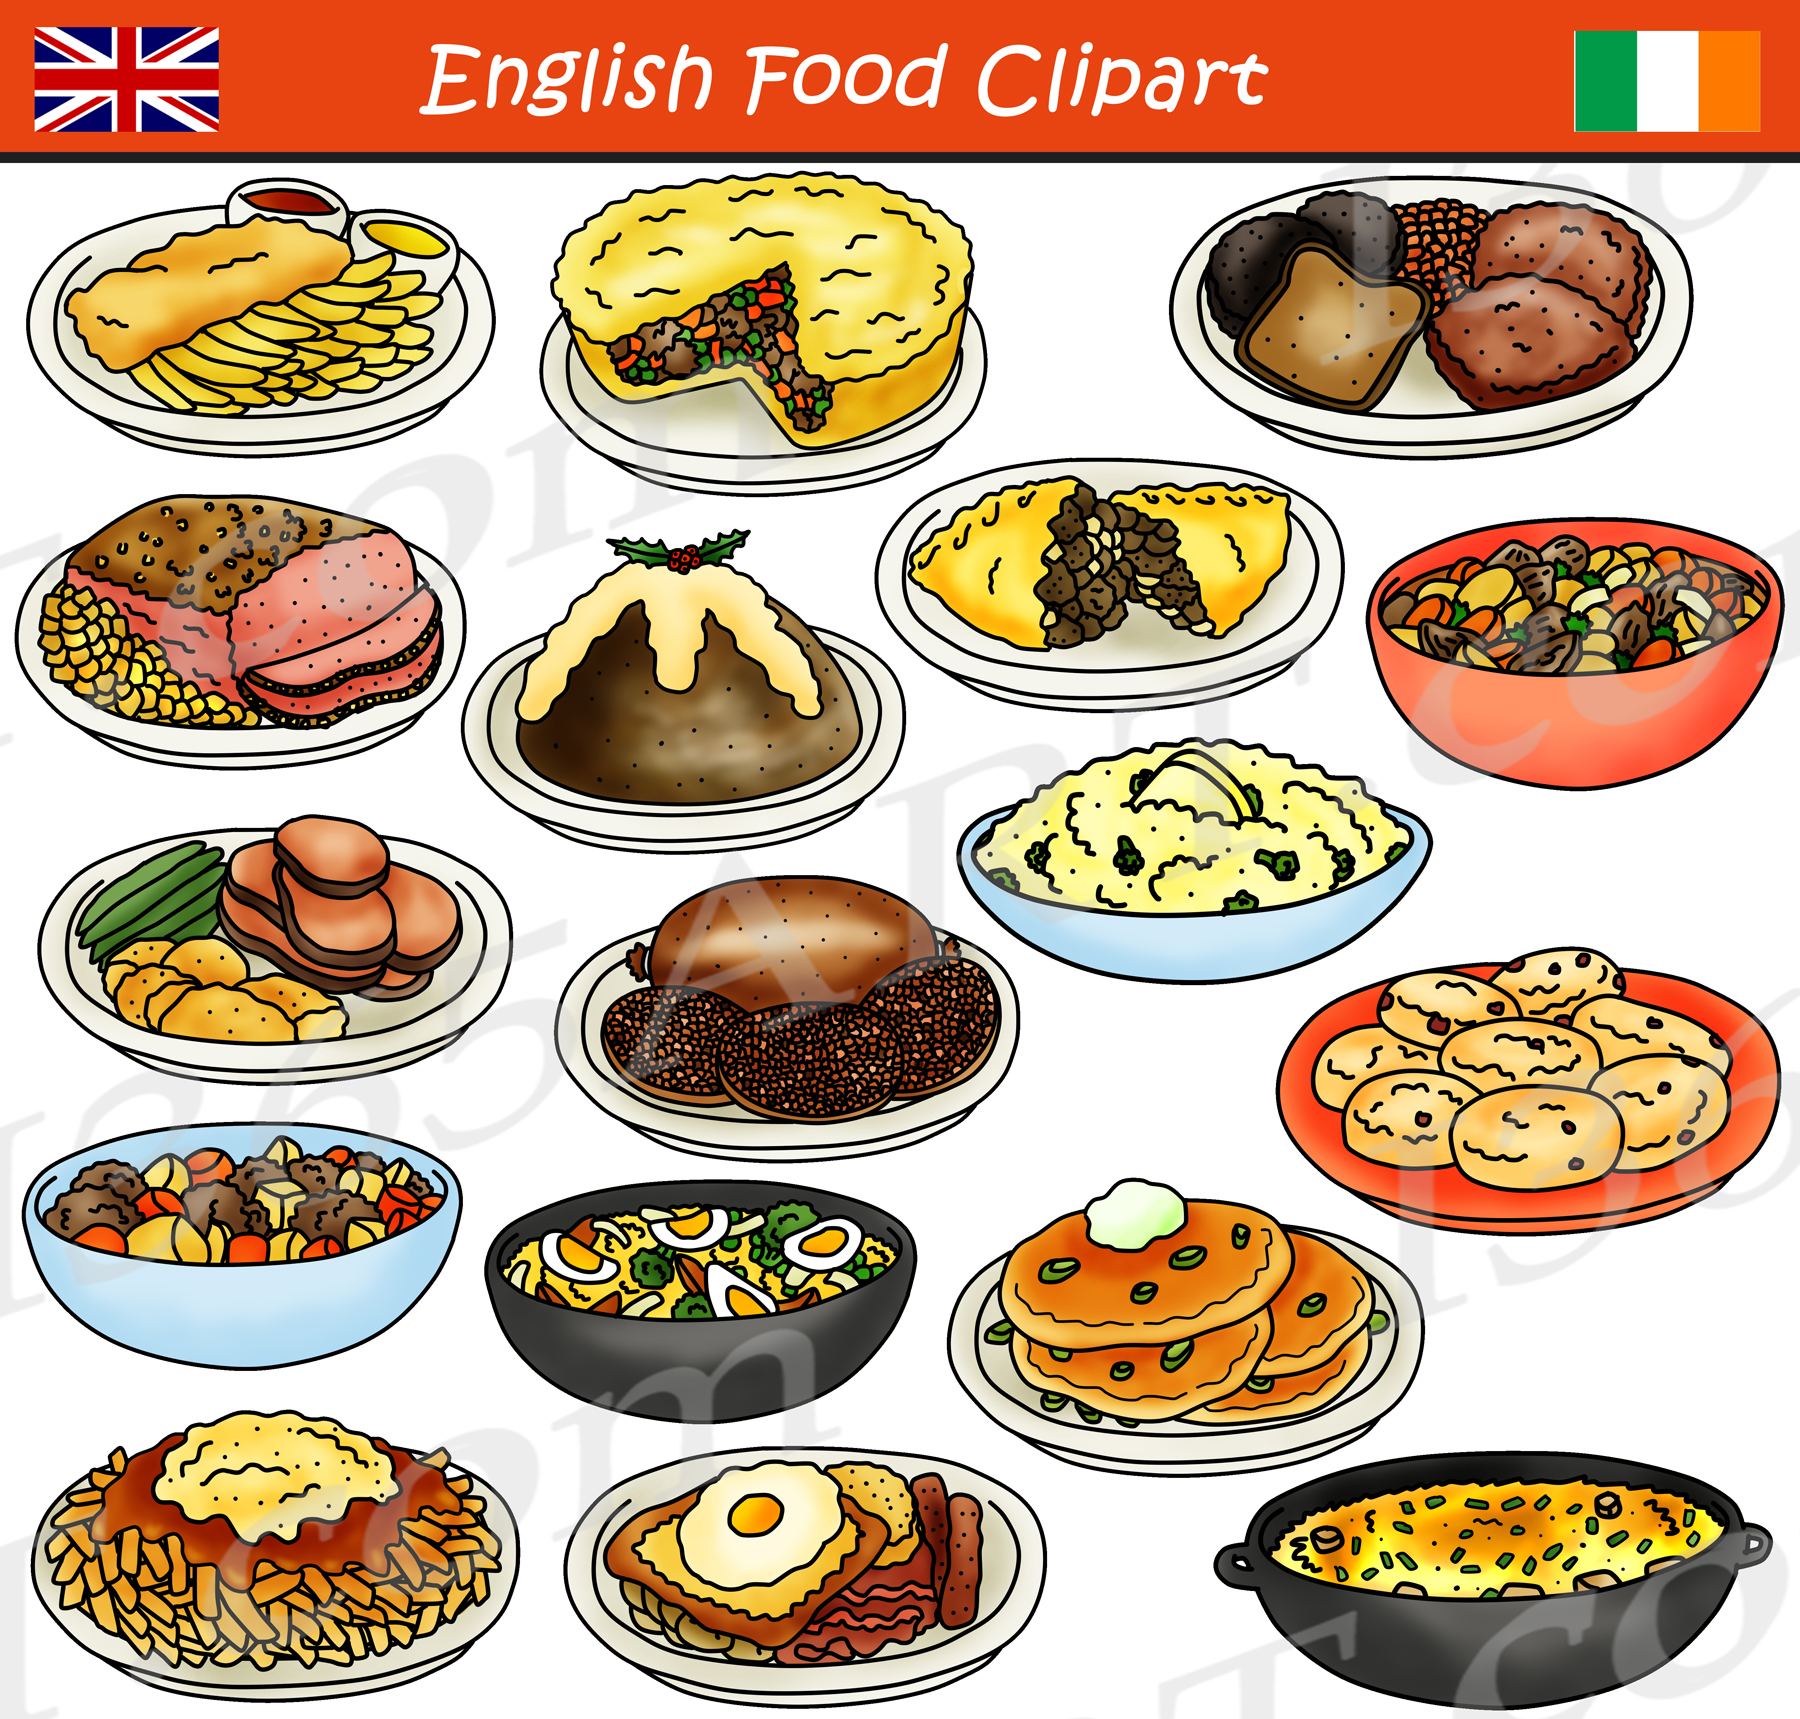 British Food Clipart.